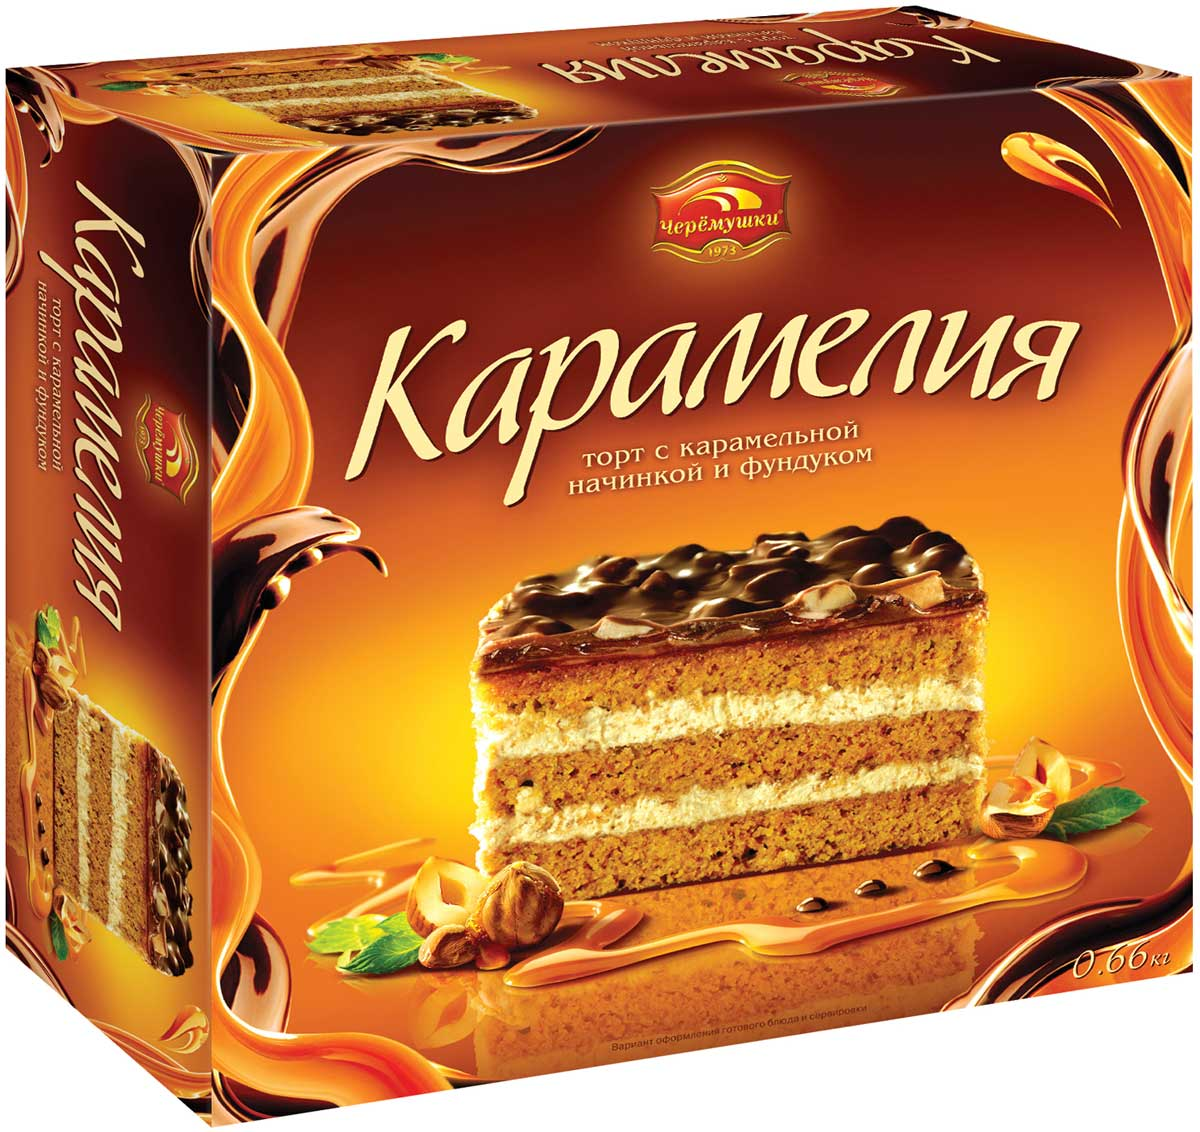 Черемушки Карамелия торт, 660 г printio торт